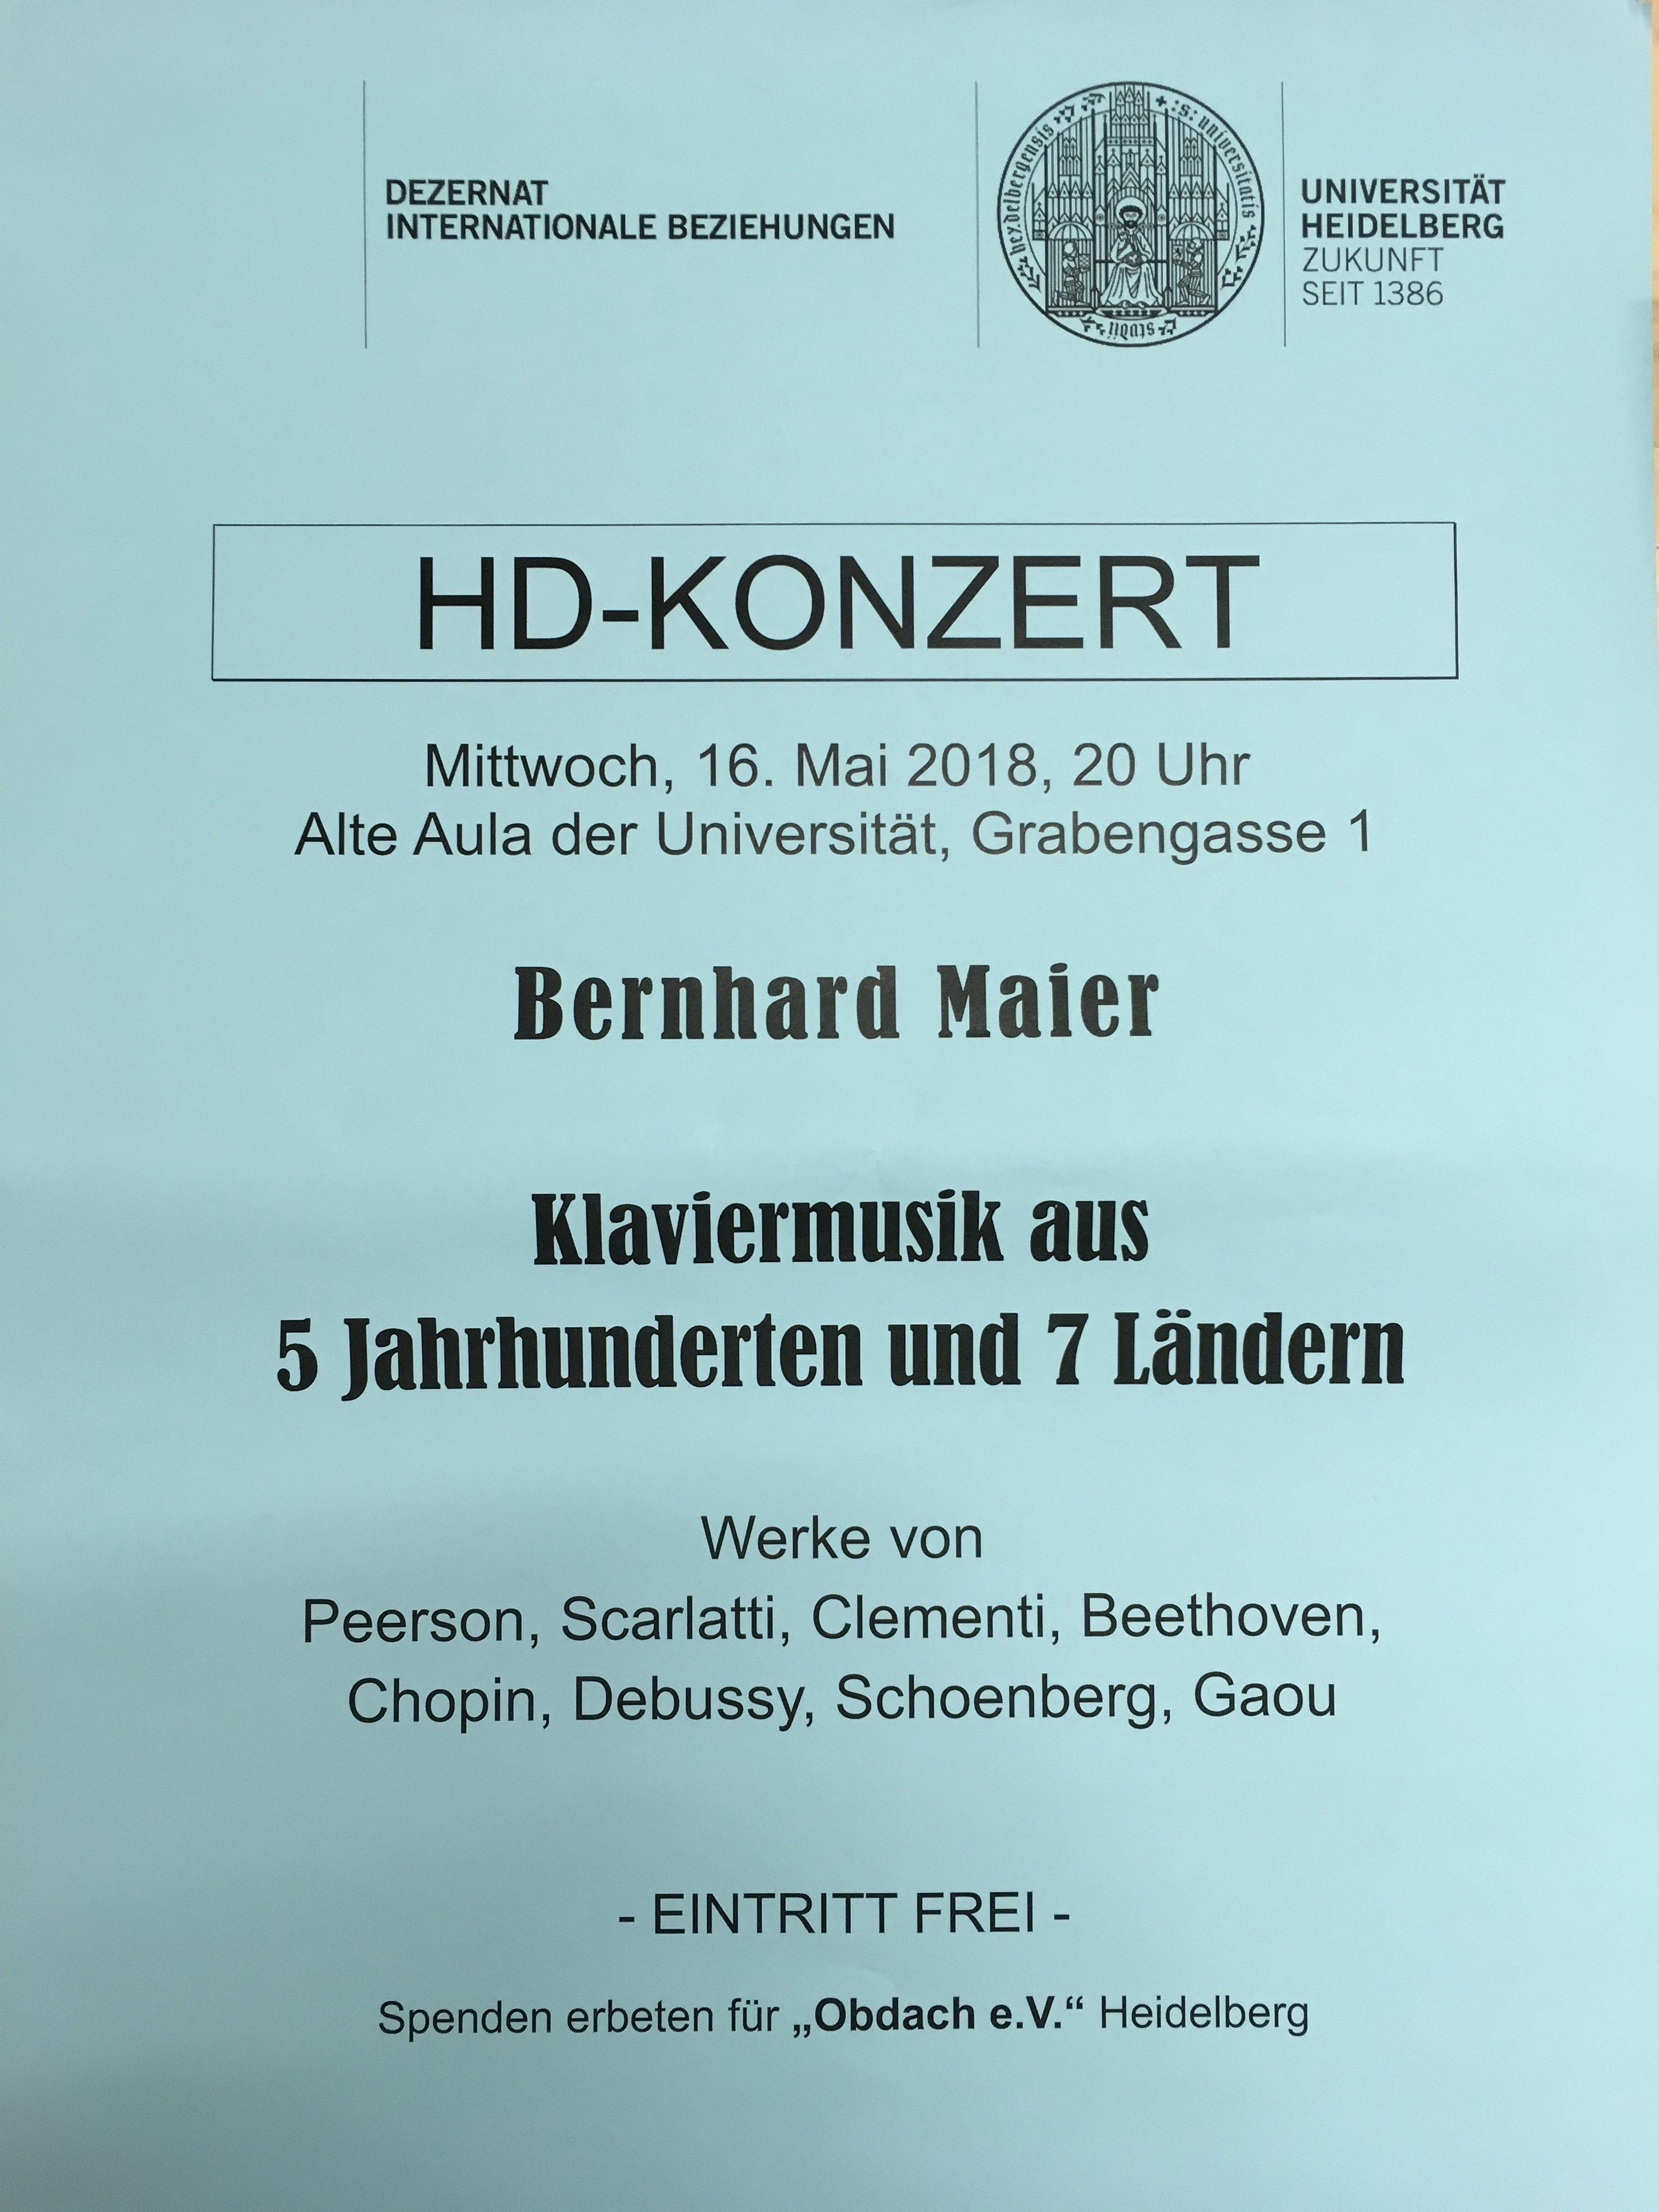 HD-Konzert